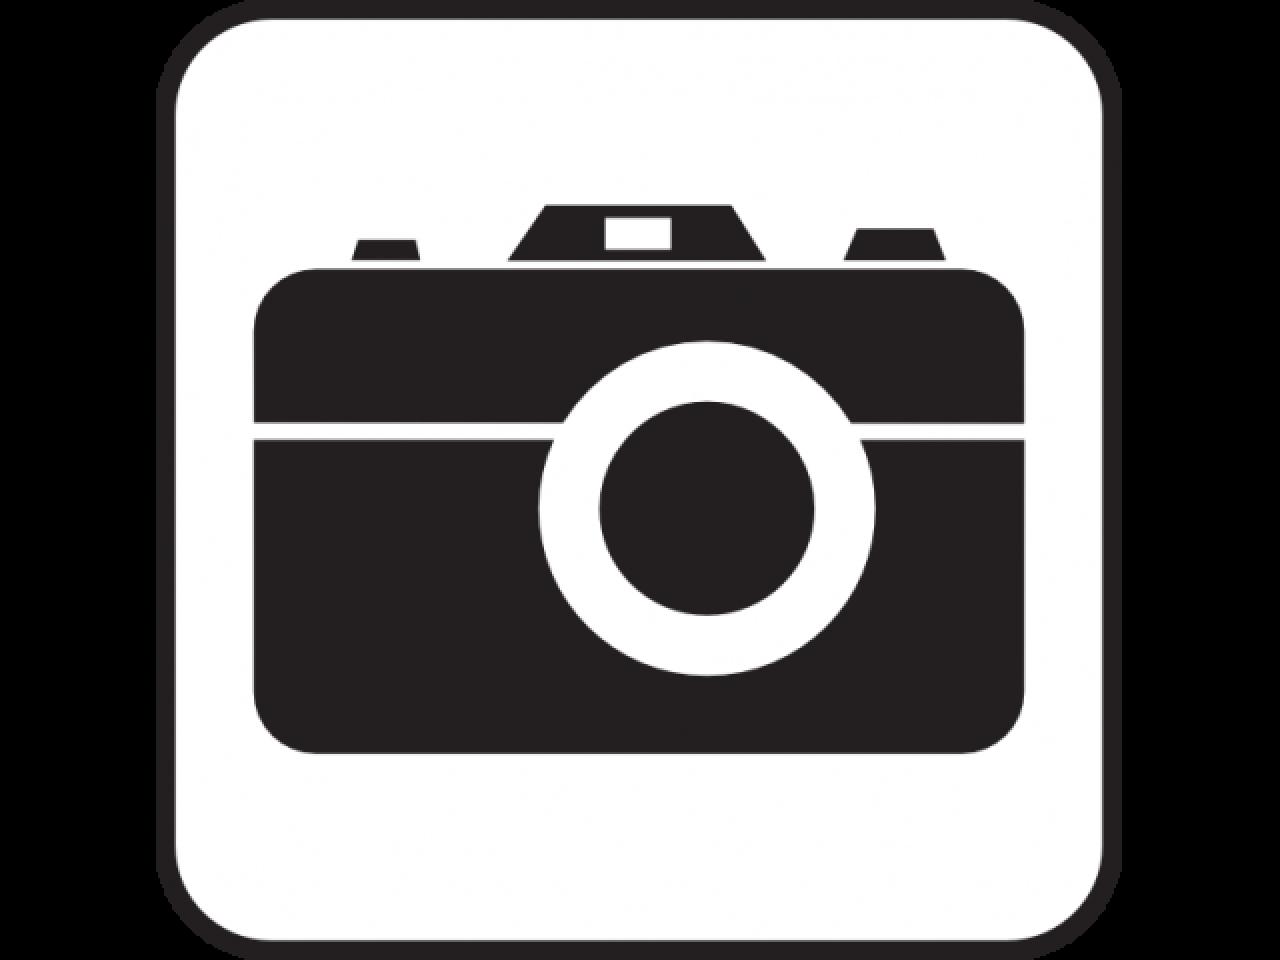 Услуги видео, фото и музыки - 1